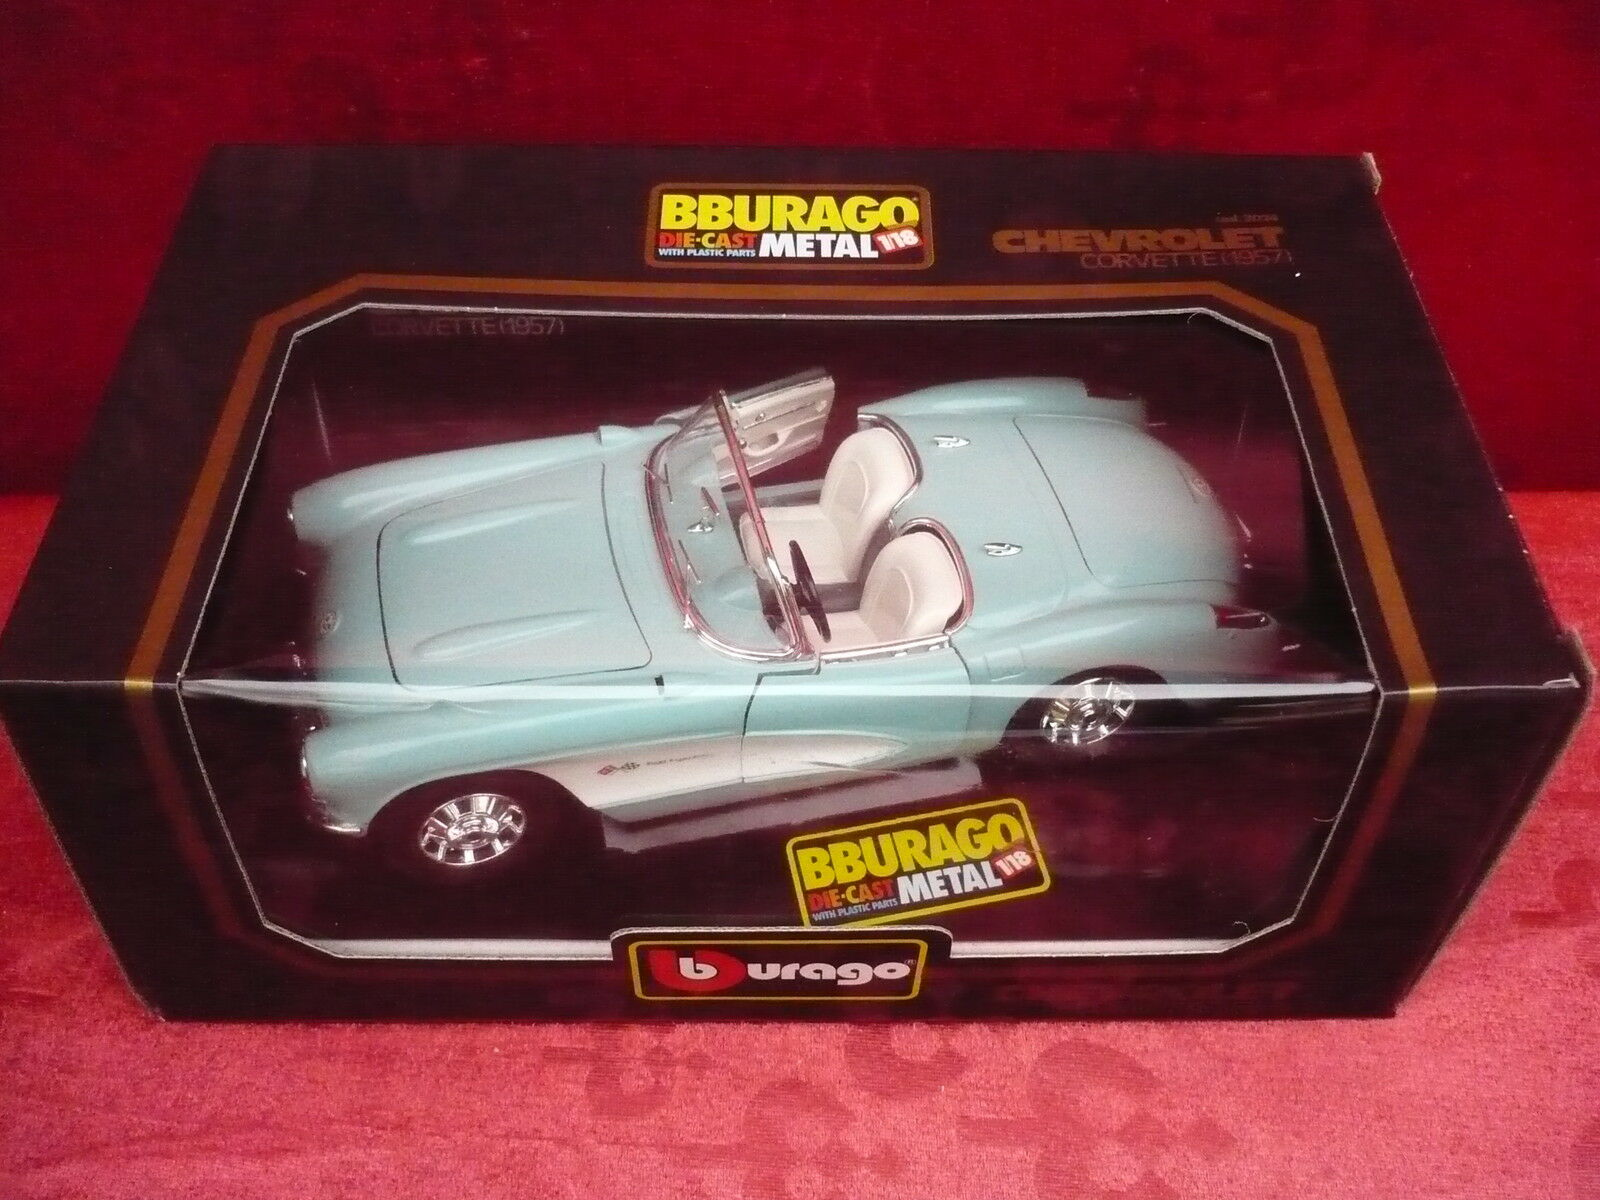 Nice Maquette de Voiture __Bburago__ Chevrolet Corvette 1957__ Métal 1 18